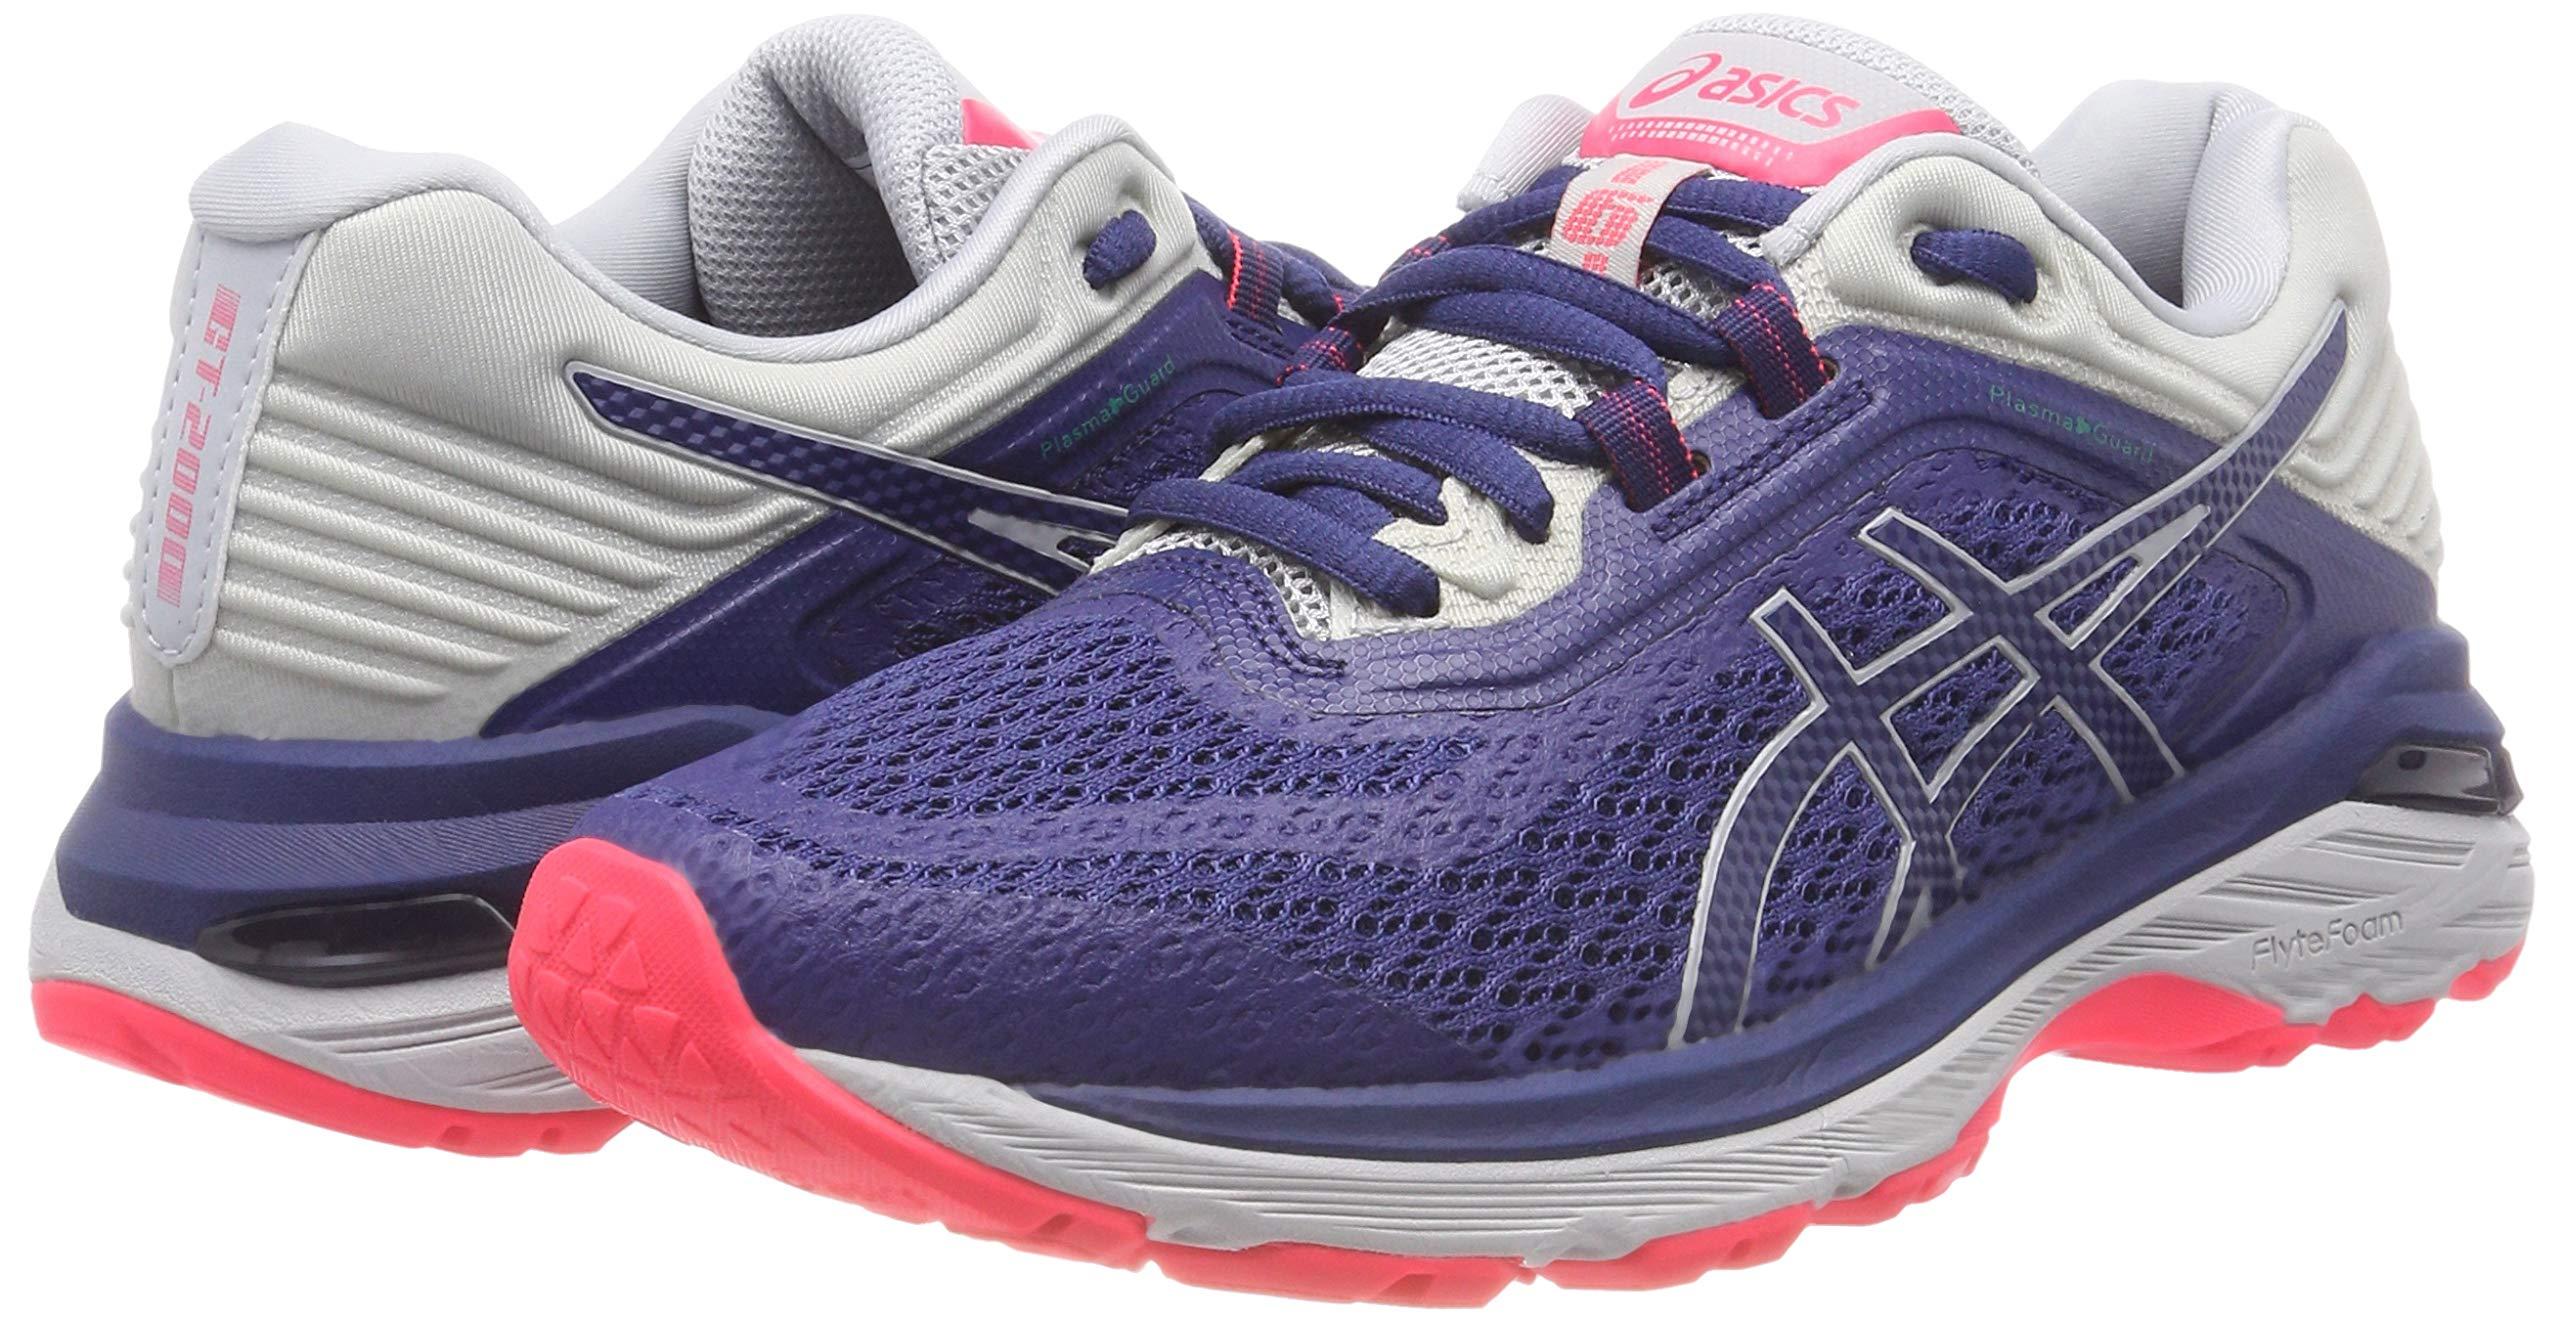 817nynTuHGL - ASICS Women's Gt-2000 6 Trail Plasmaguard Running Shoes, 11.5 UK